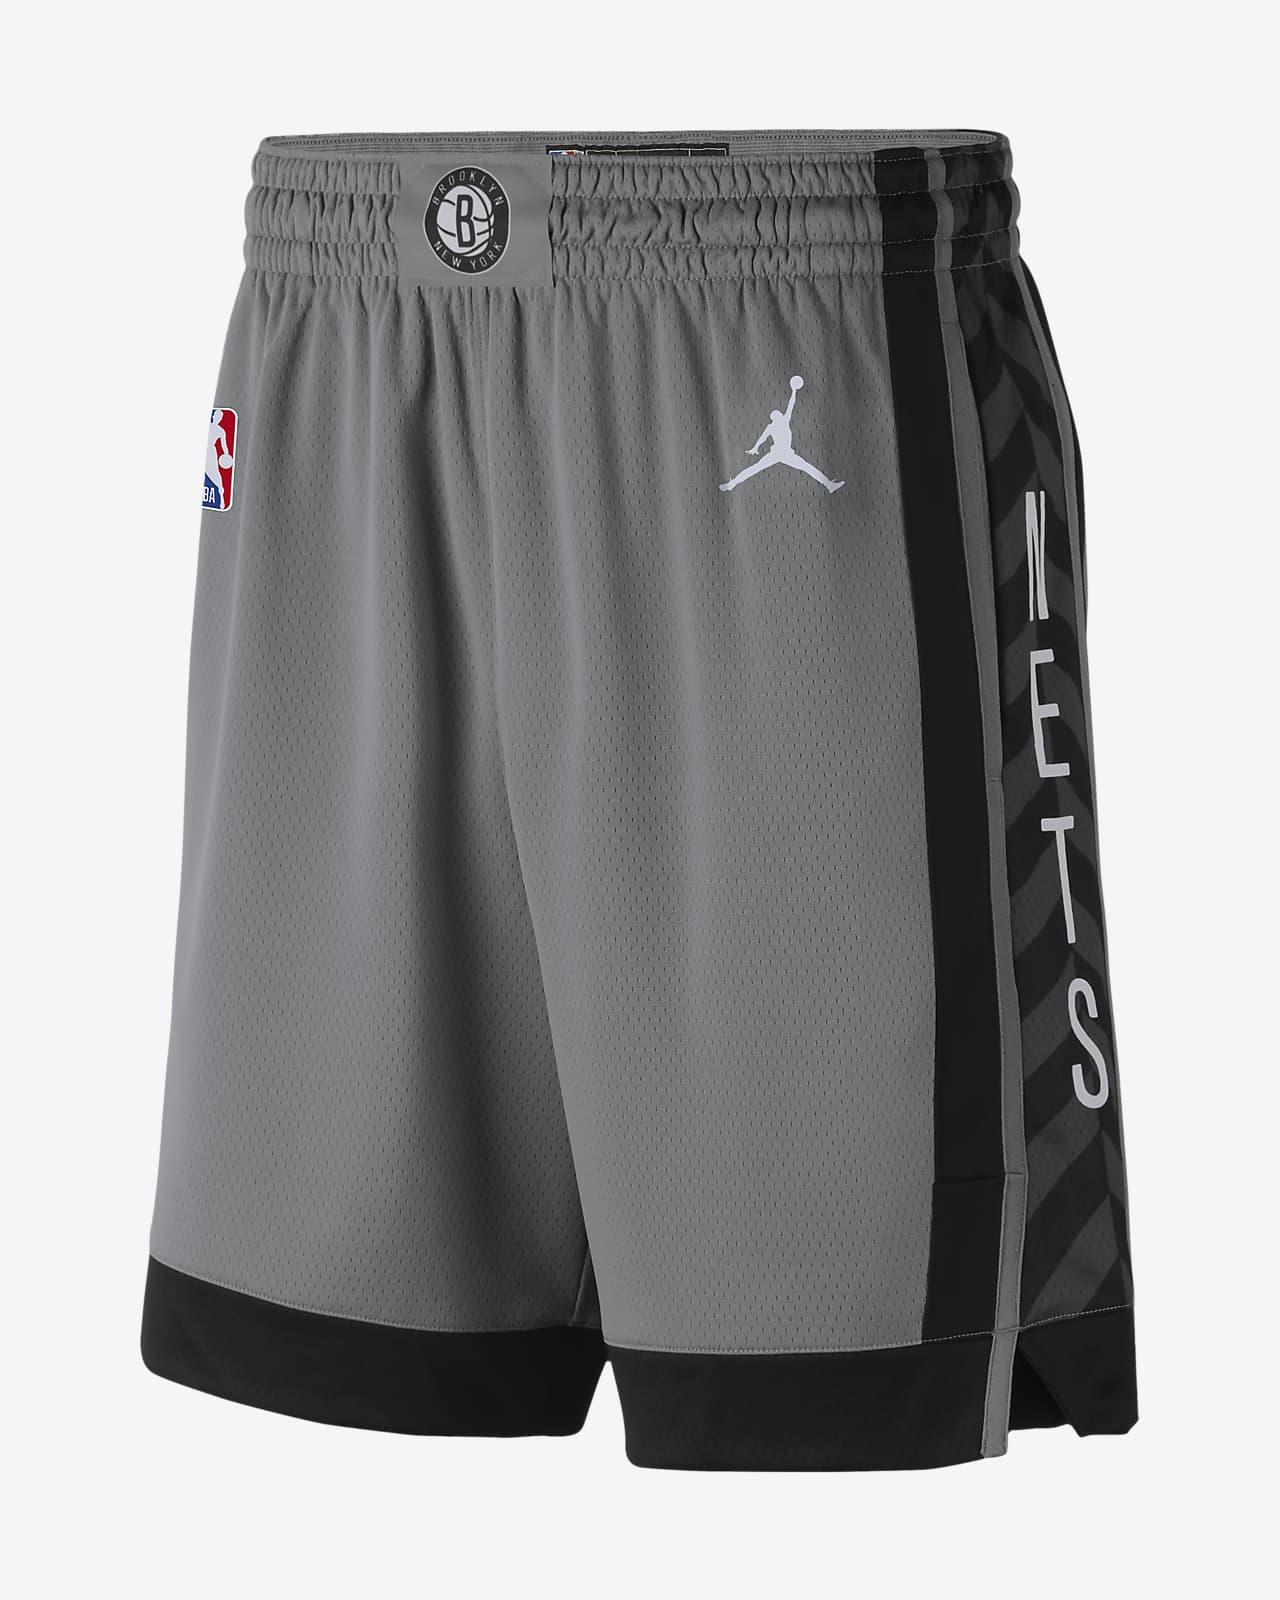 Spodenki męskie Jordan NBA Swingman Nets Statement Edition 2020